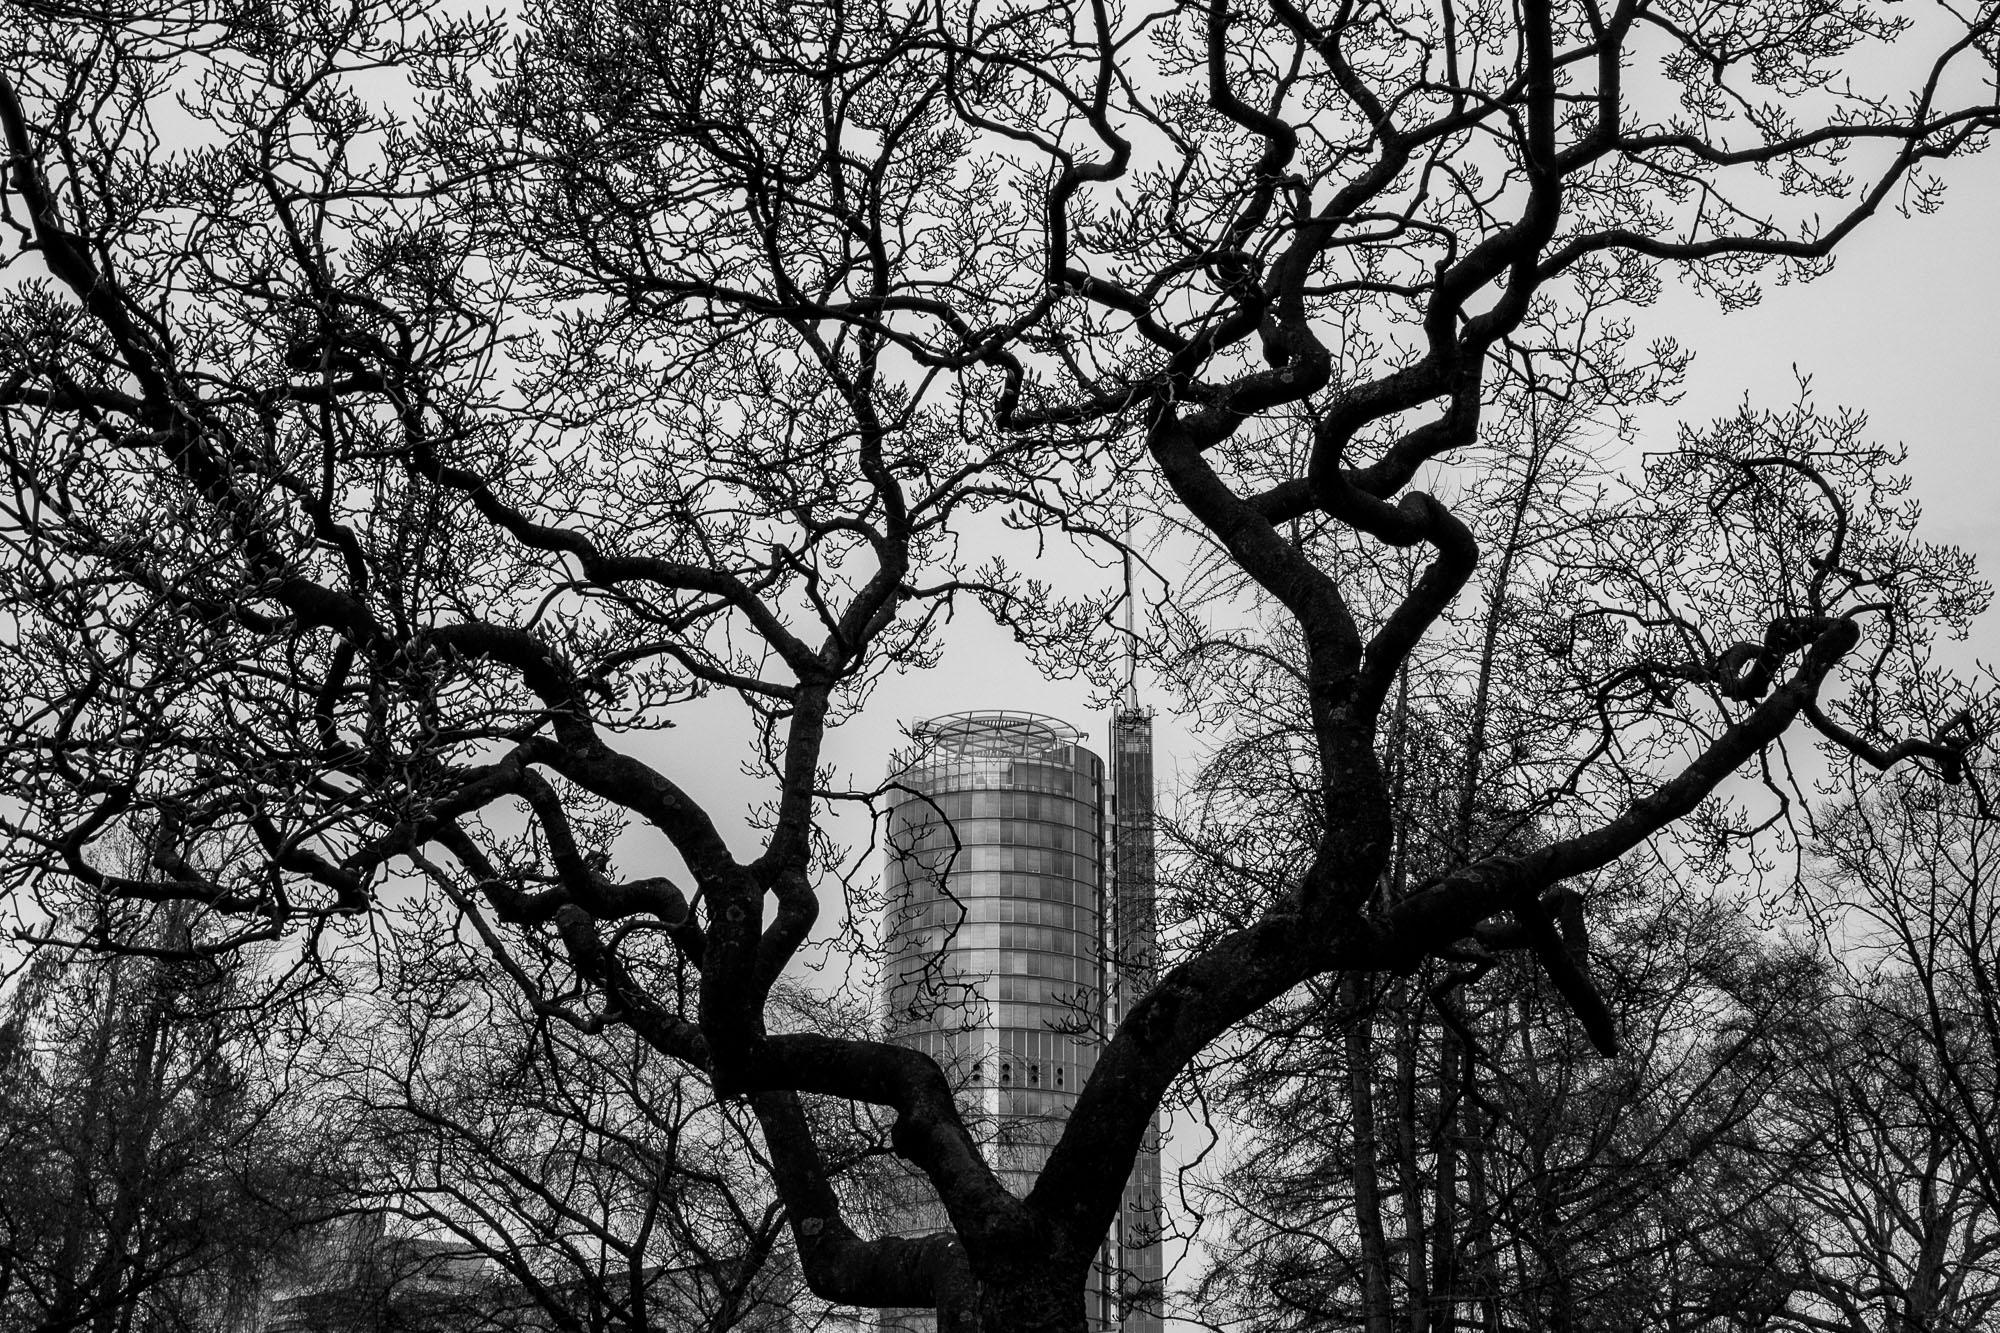 RWE-Turm in Essen shown through tree branches